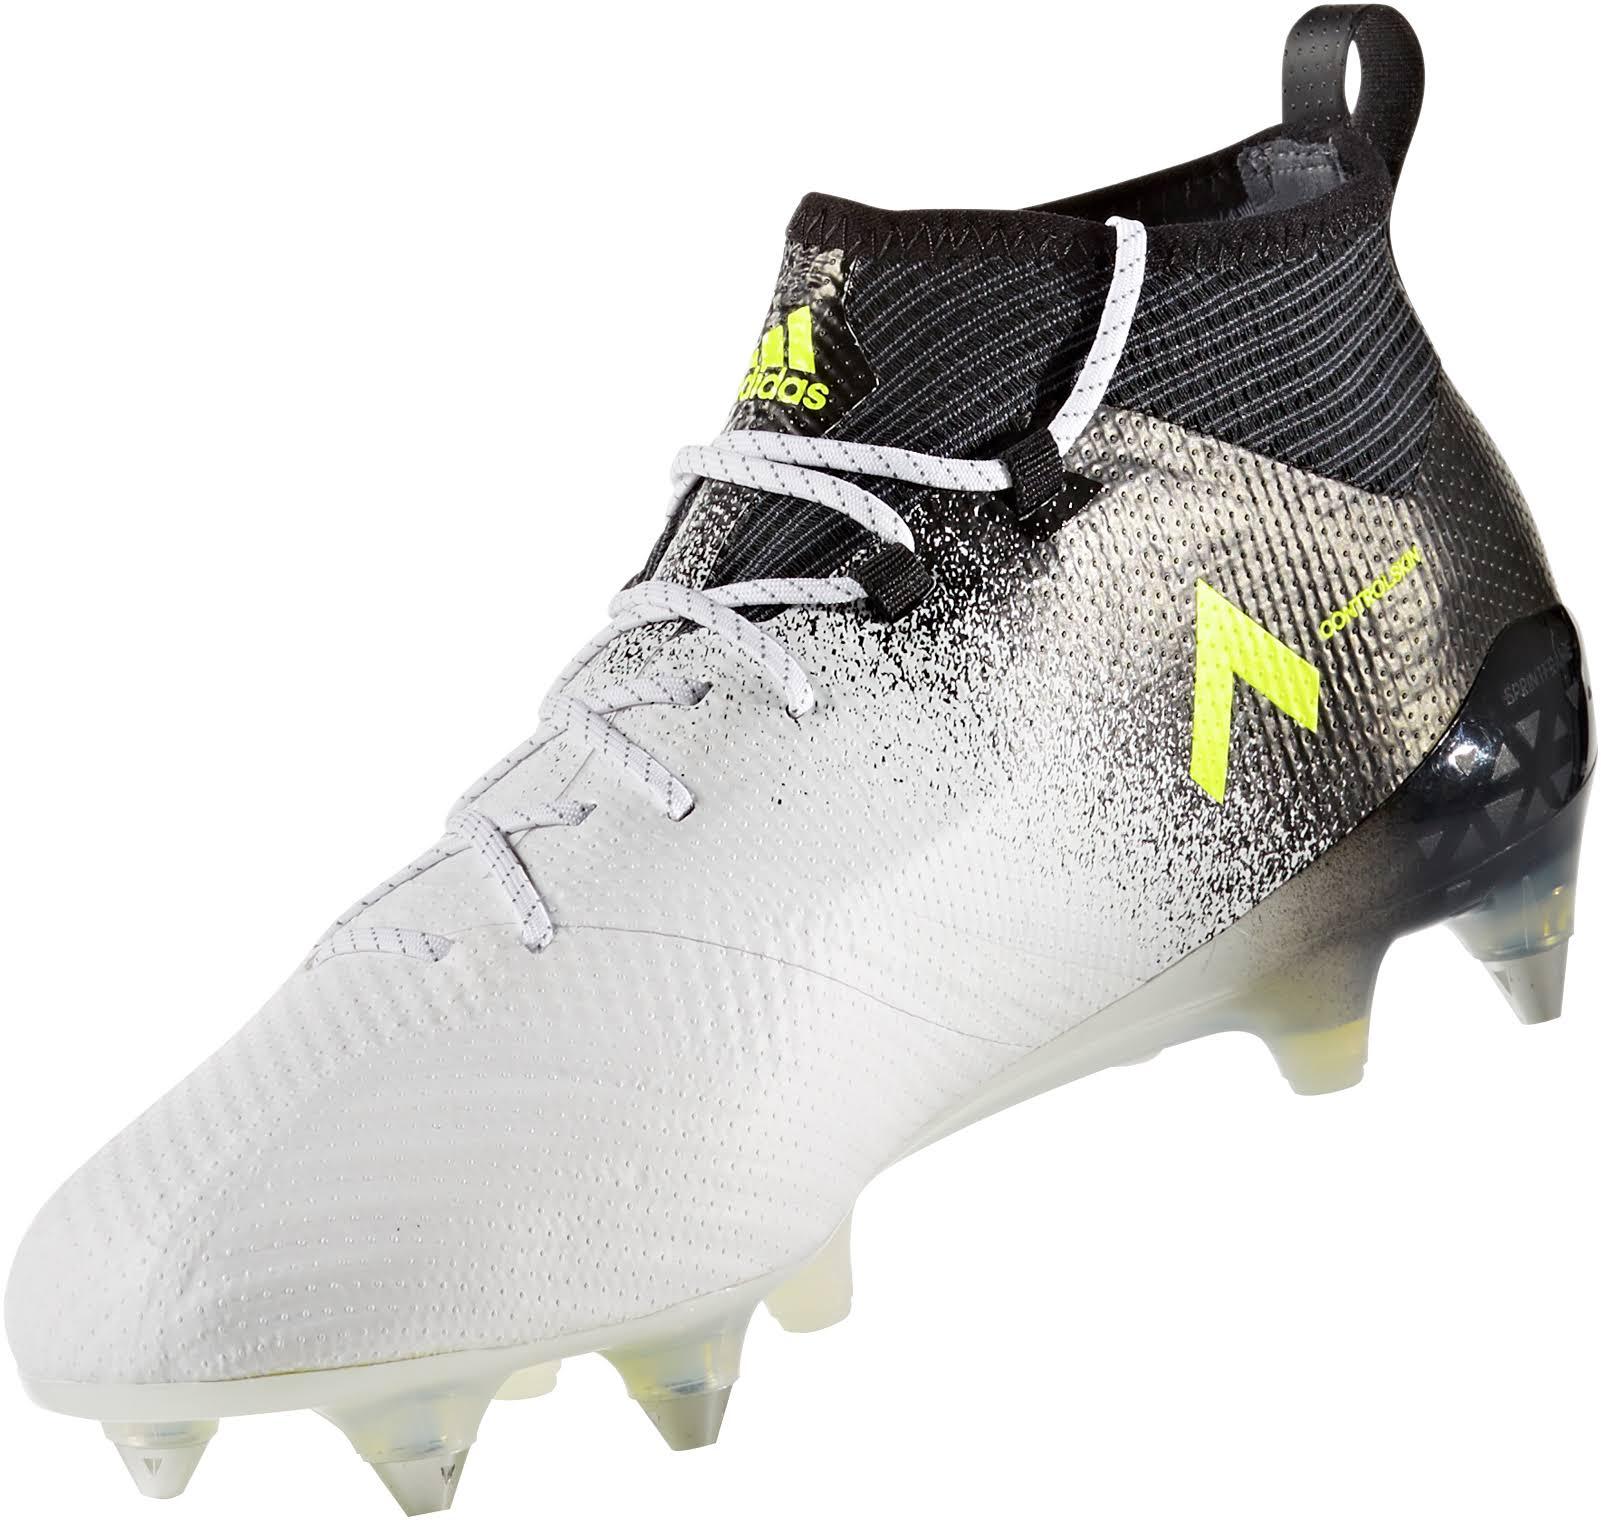 17 Adidas Ace Ftwrwhite 1 Black Yellow Sg white Storm Solaryellow Dust Coreblack FFqCWr5wH